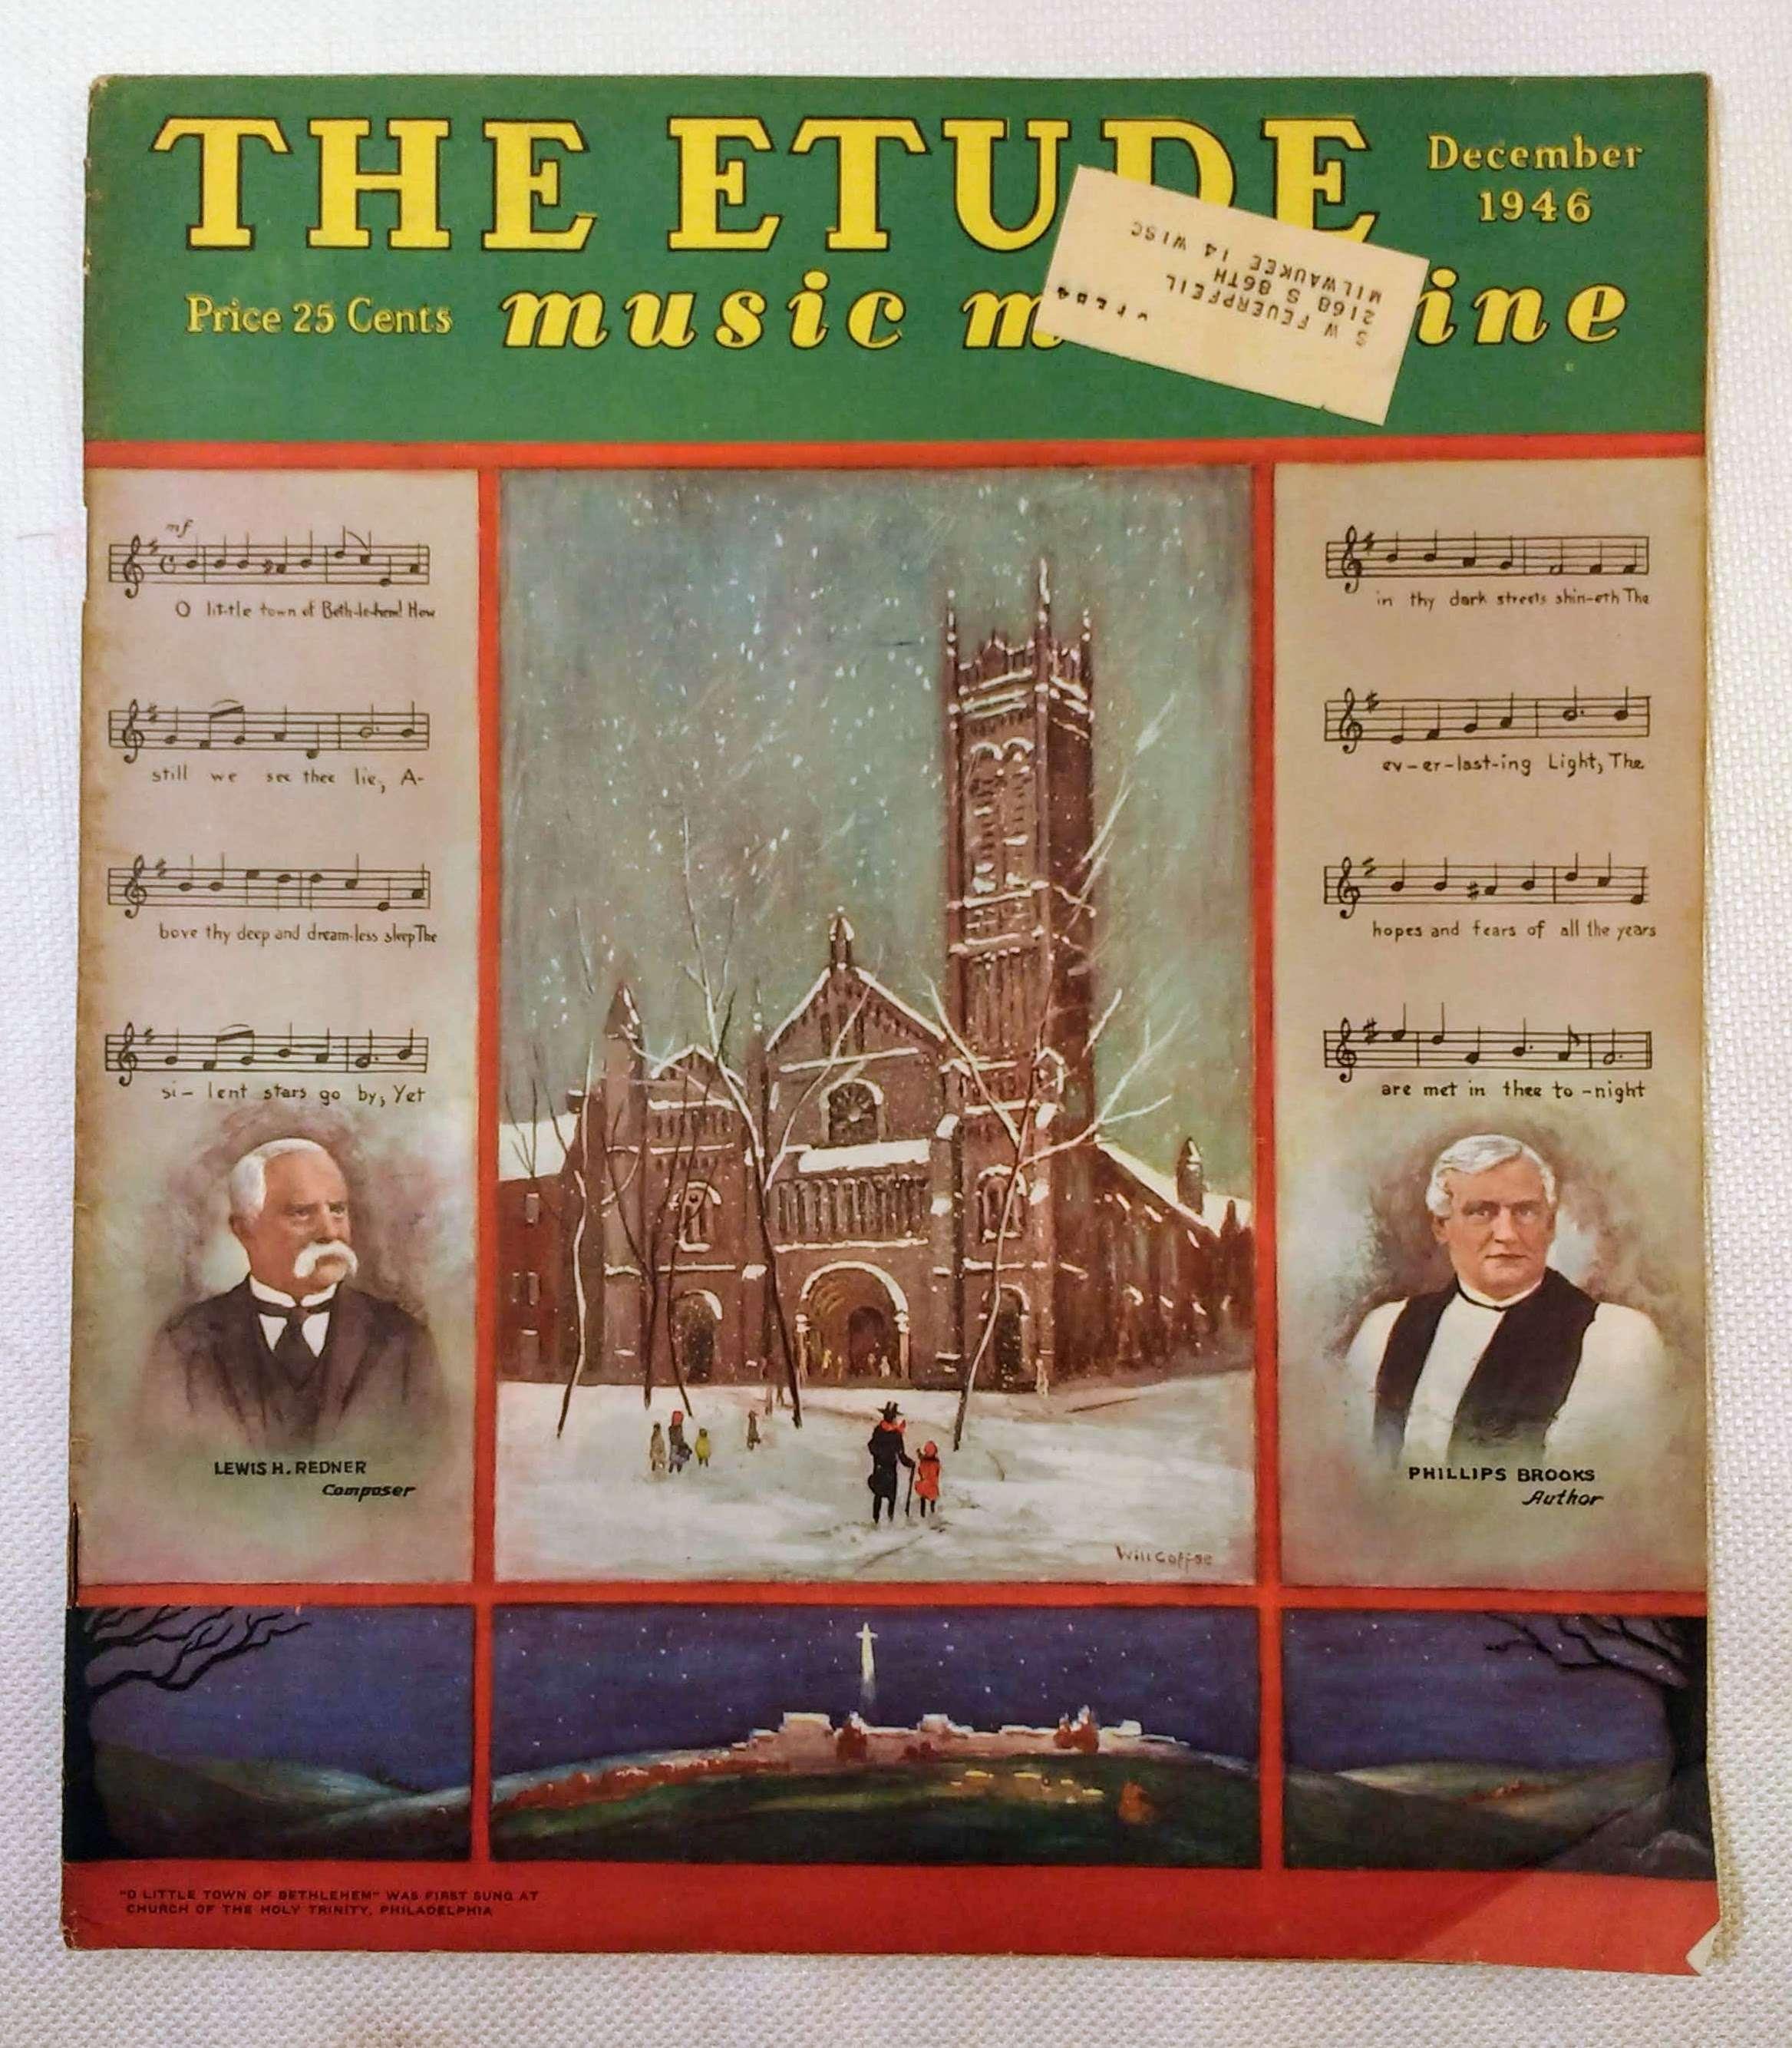 The Etude Music Magazine: Volume LXIV, No. 12; December, 1946, Cooke, James Francis [ed.]